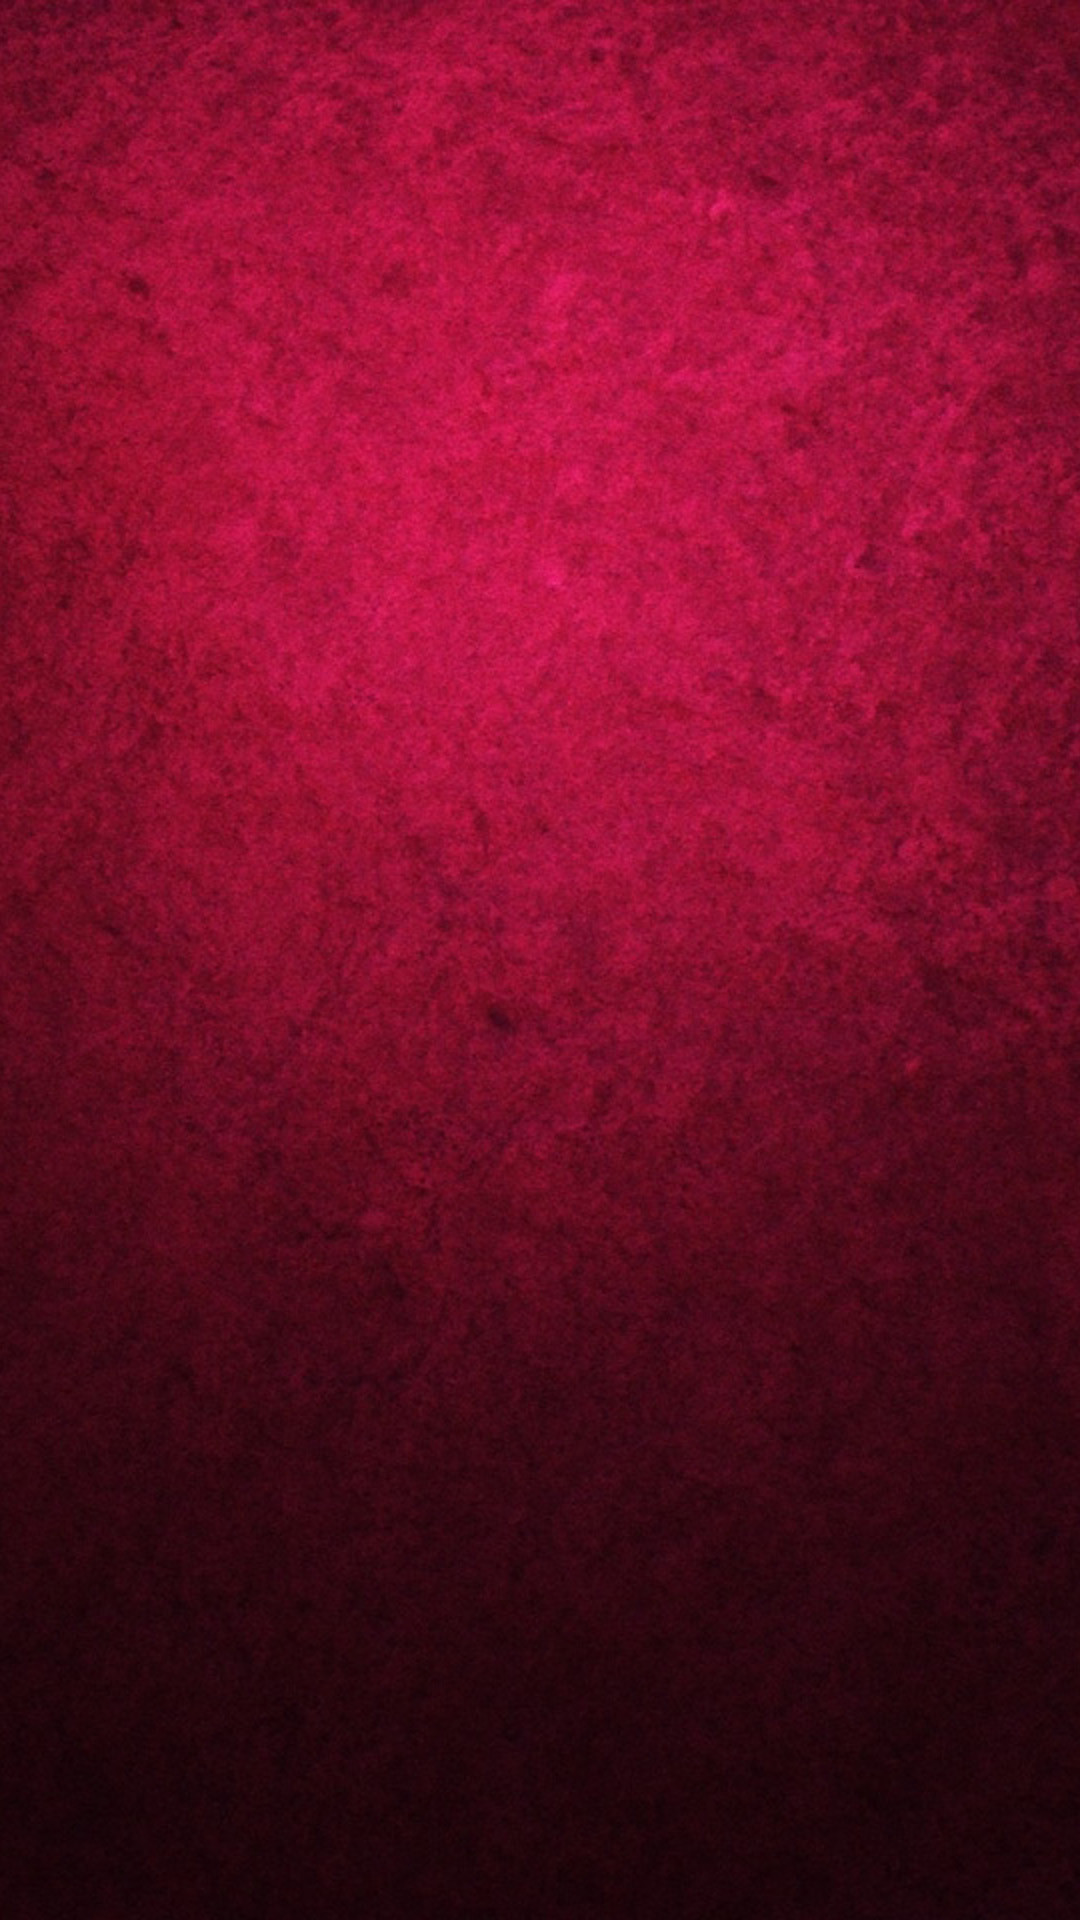 Background Purple-Shadow HD Wallpaper iPhone 6 plus